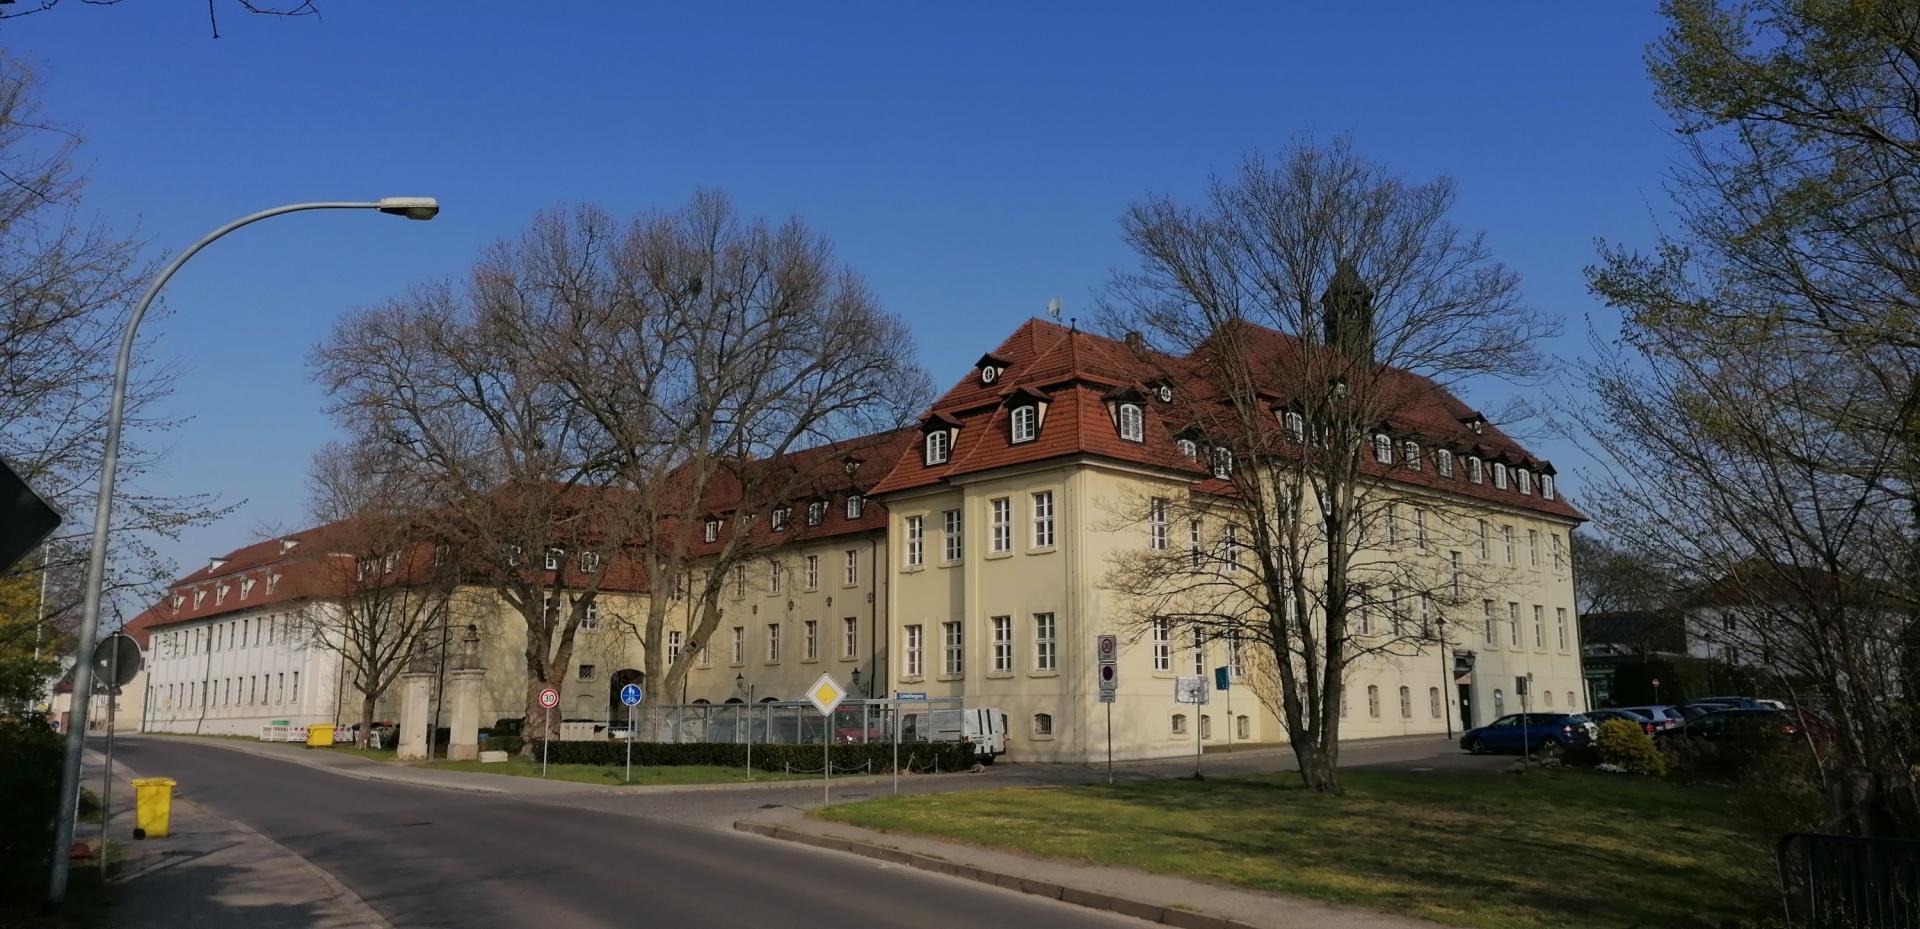 2021-05_Siehdichum._Landratsamt_Sparkasse